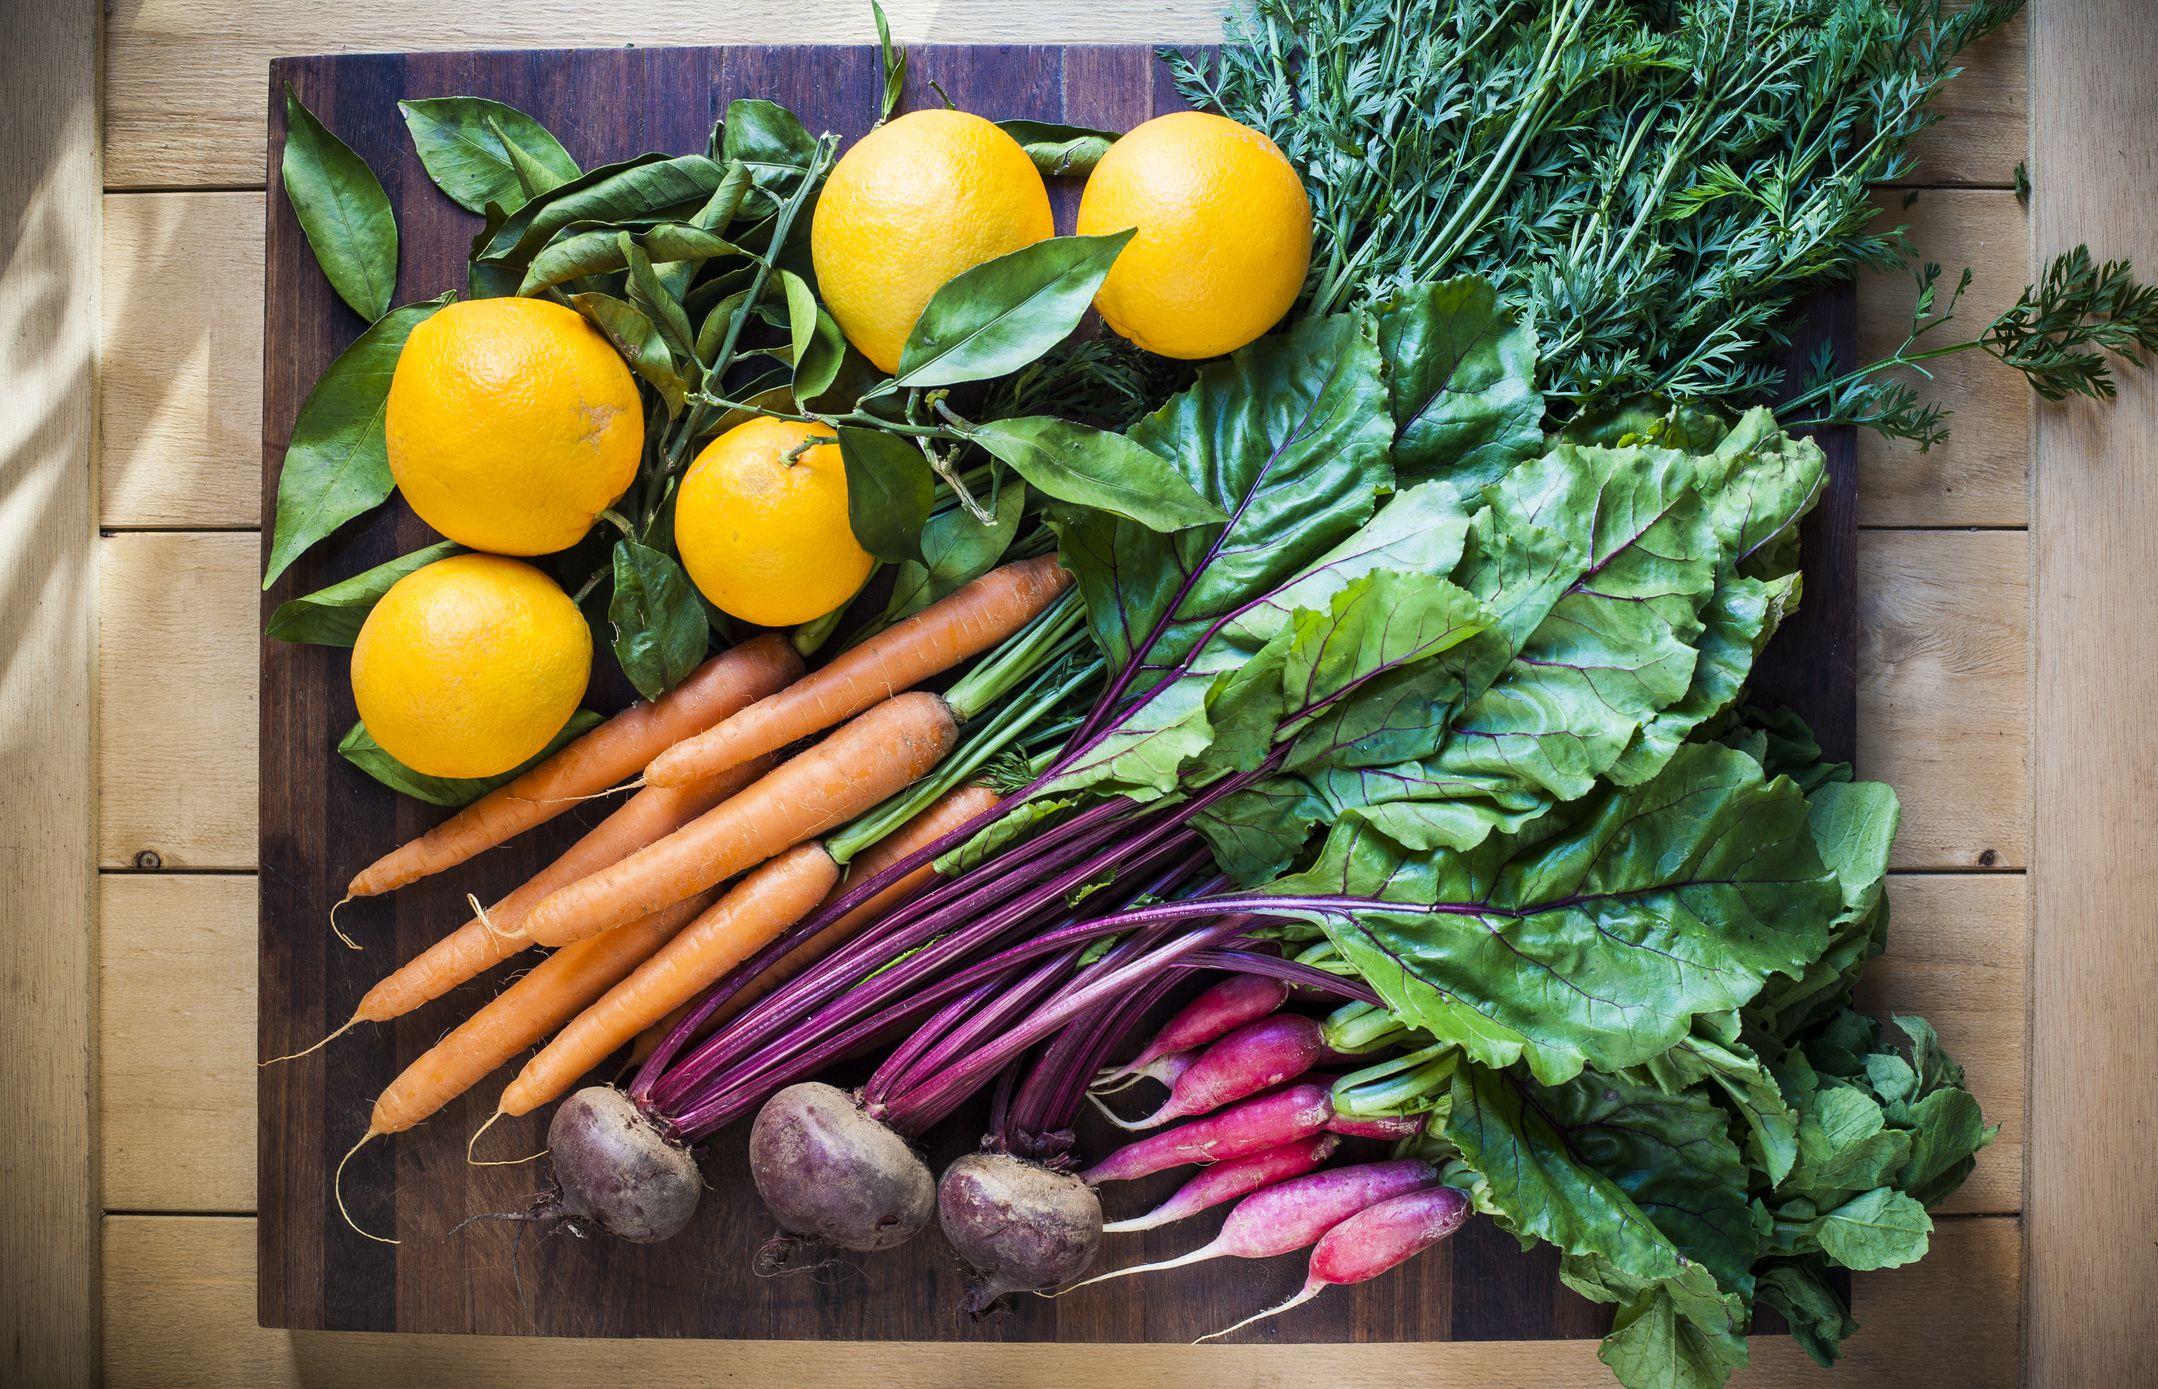 hawaii seasonal fruits and vegetables alphabetical list